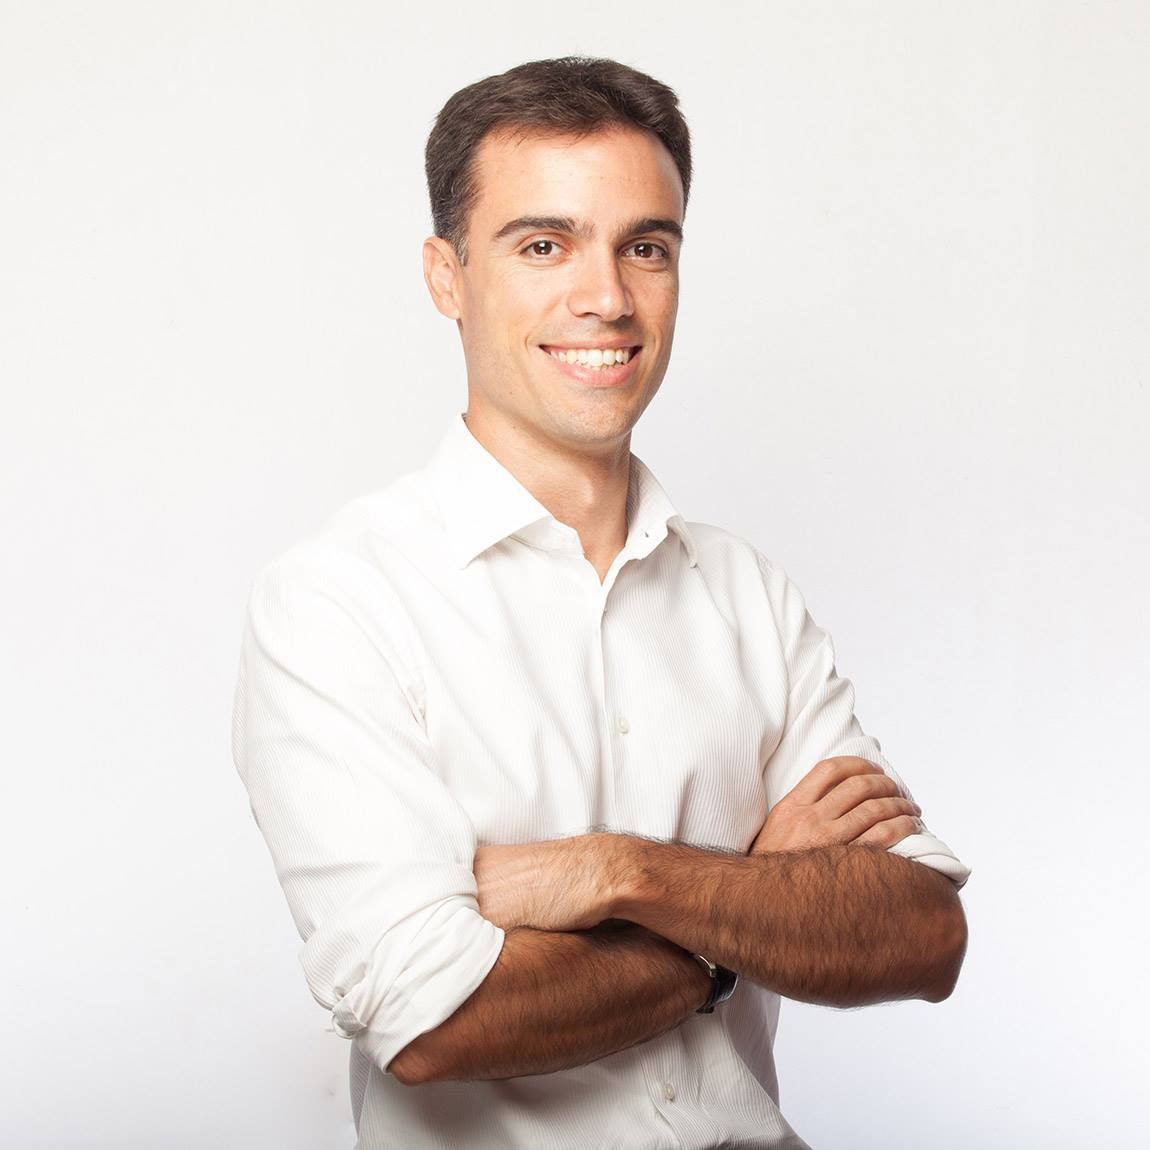 Sergio from San Cristóbal de La Laguna